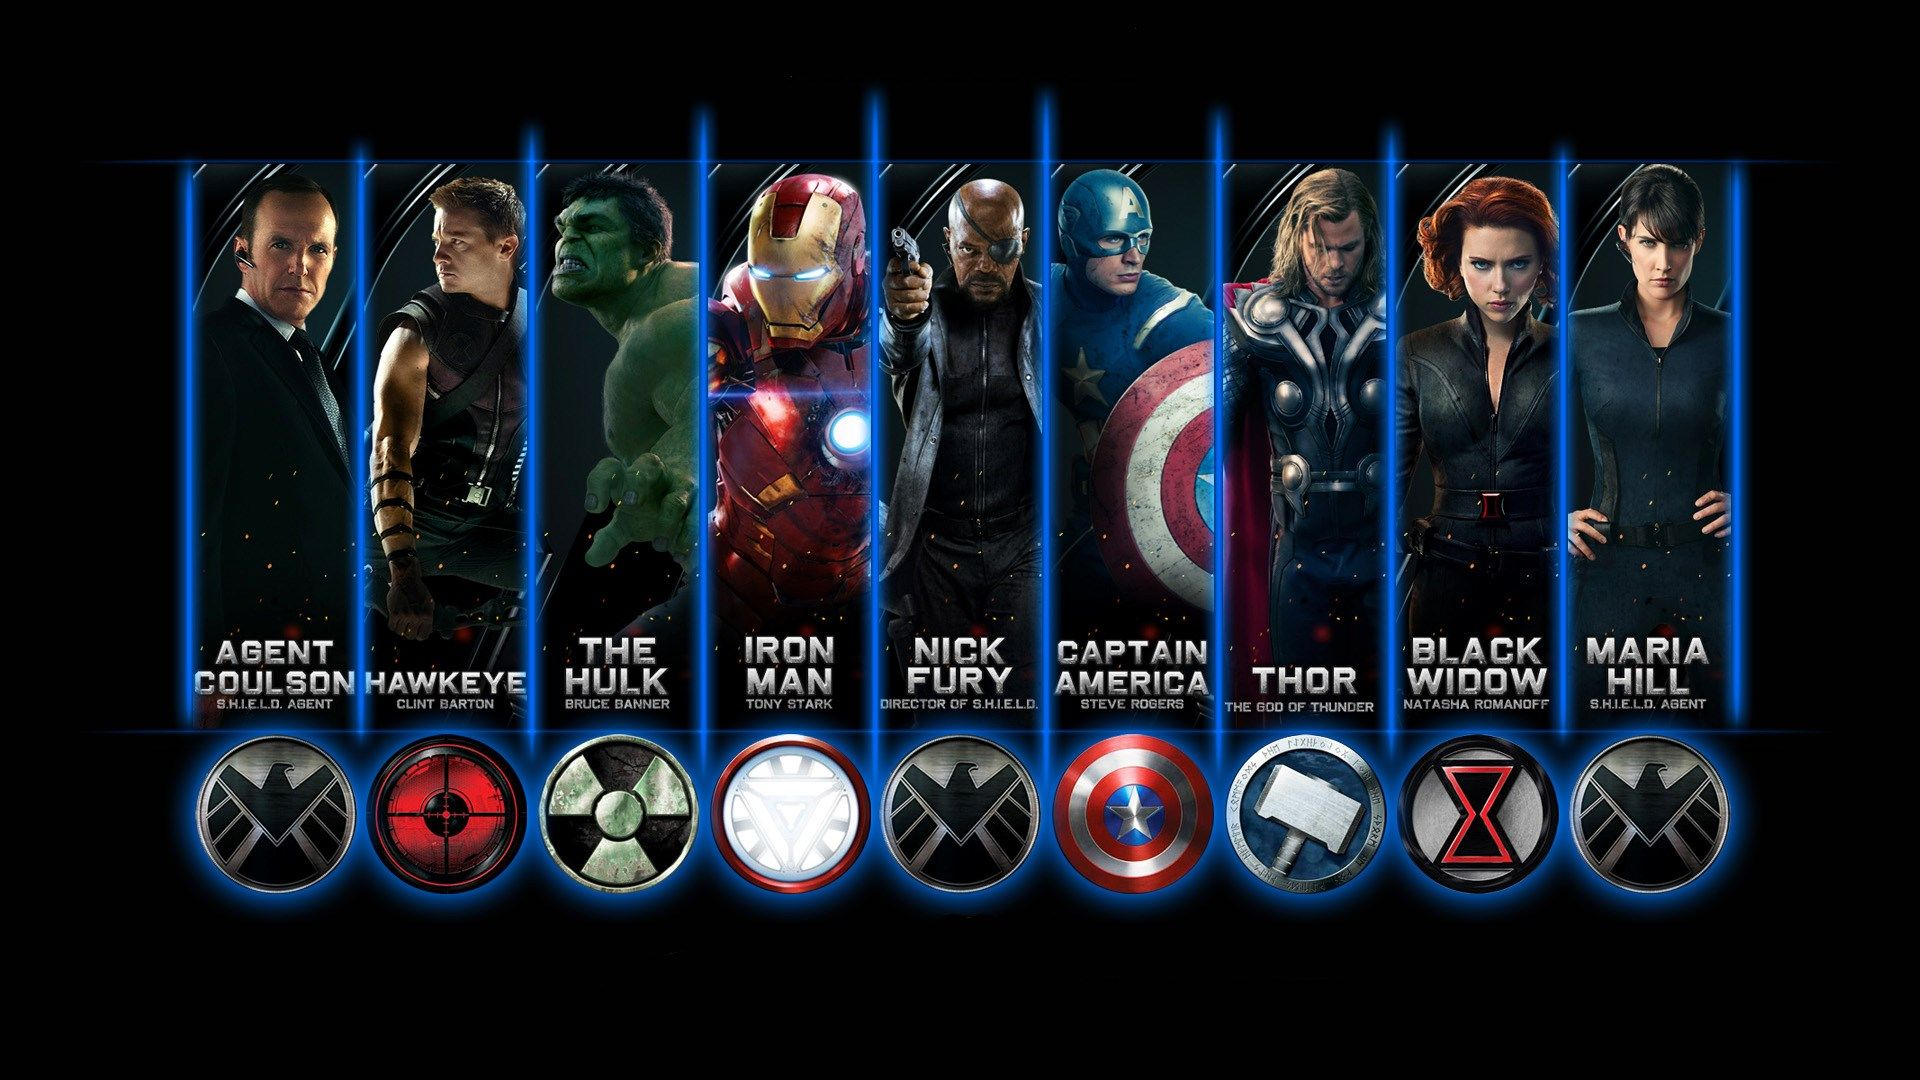 Avengers Desktop Wallpapers Top Free Avengers Desktop Backgrounds